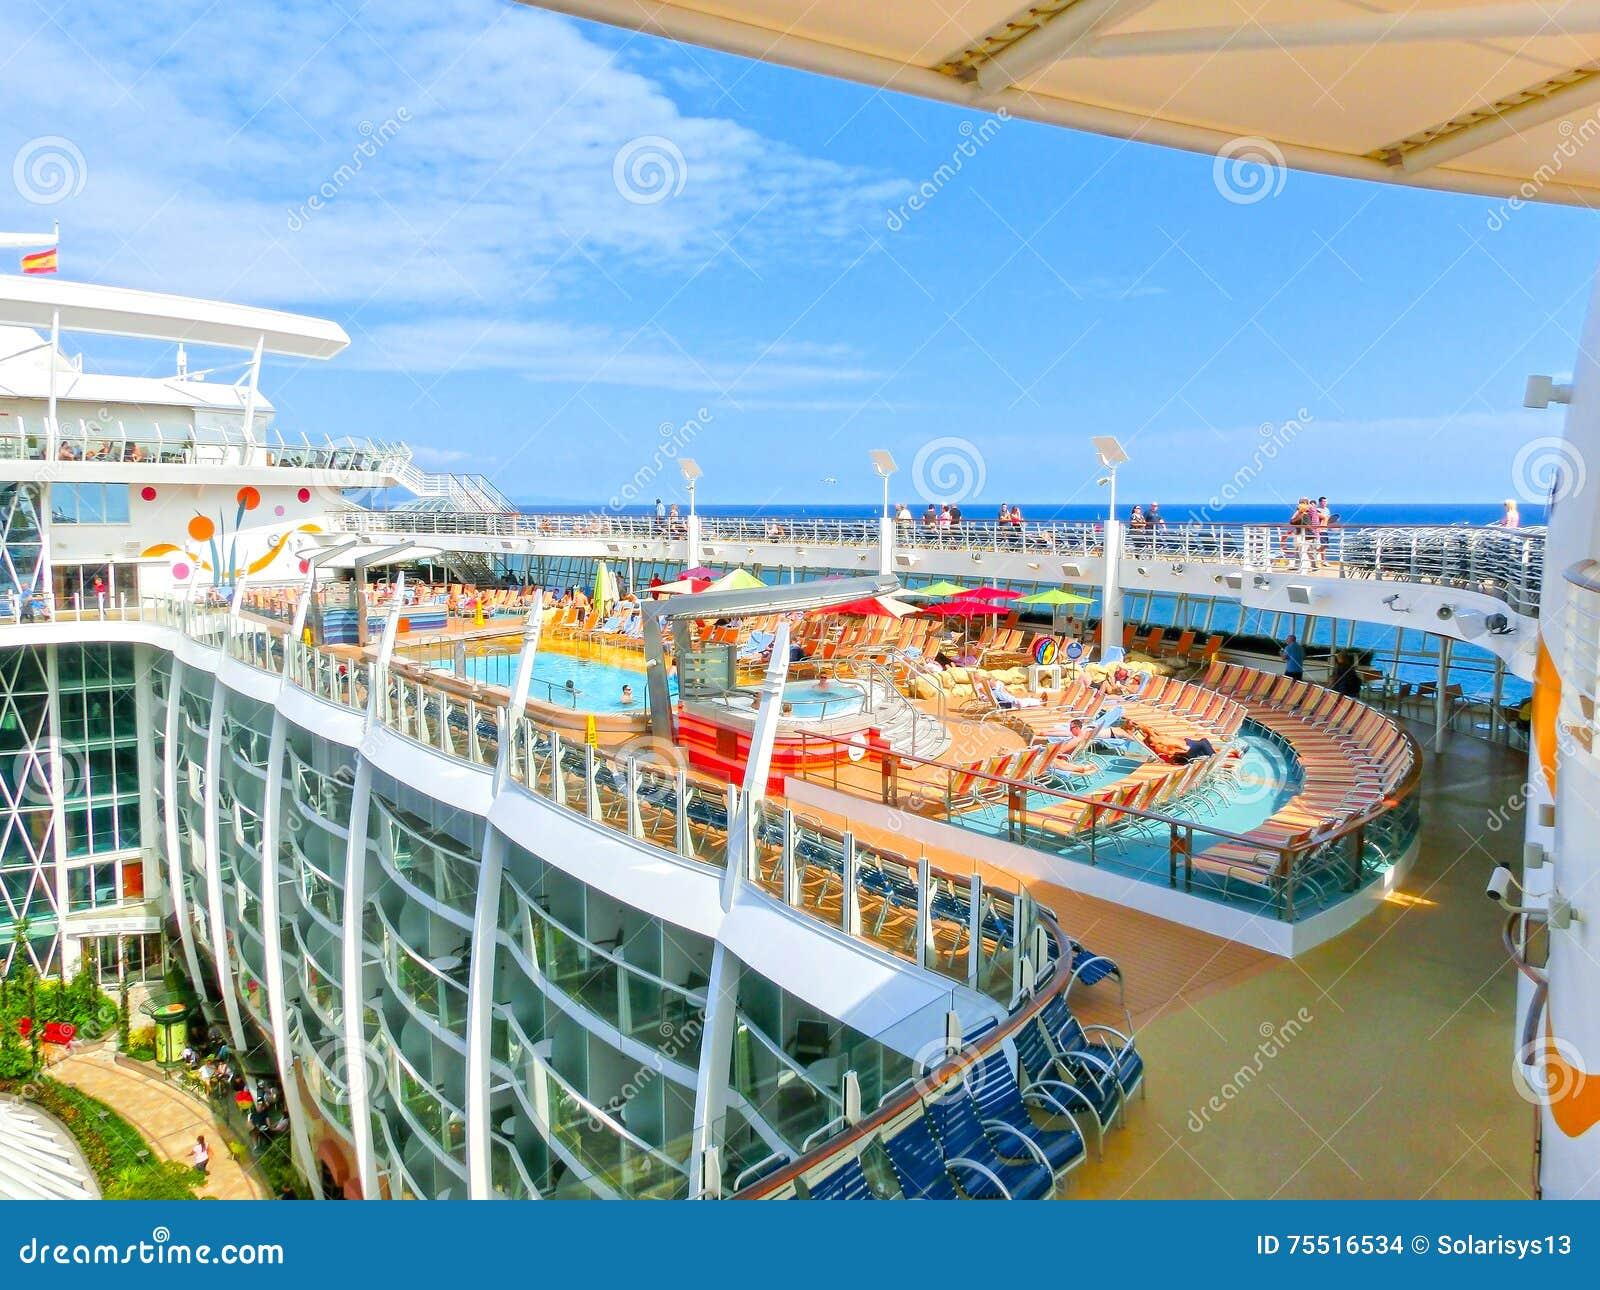 Barselona, Spaine - 6 Σεπτεμβρίου 2015: Βασιλικές Καραϊβικές Θάλασσες, γοητεία των θαλασσών